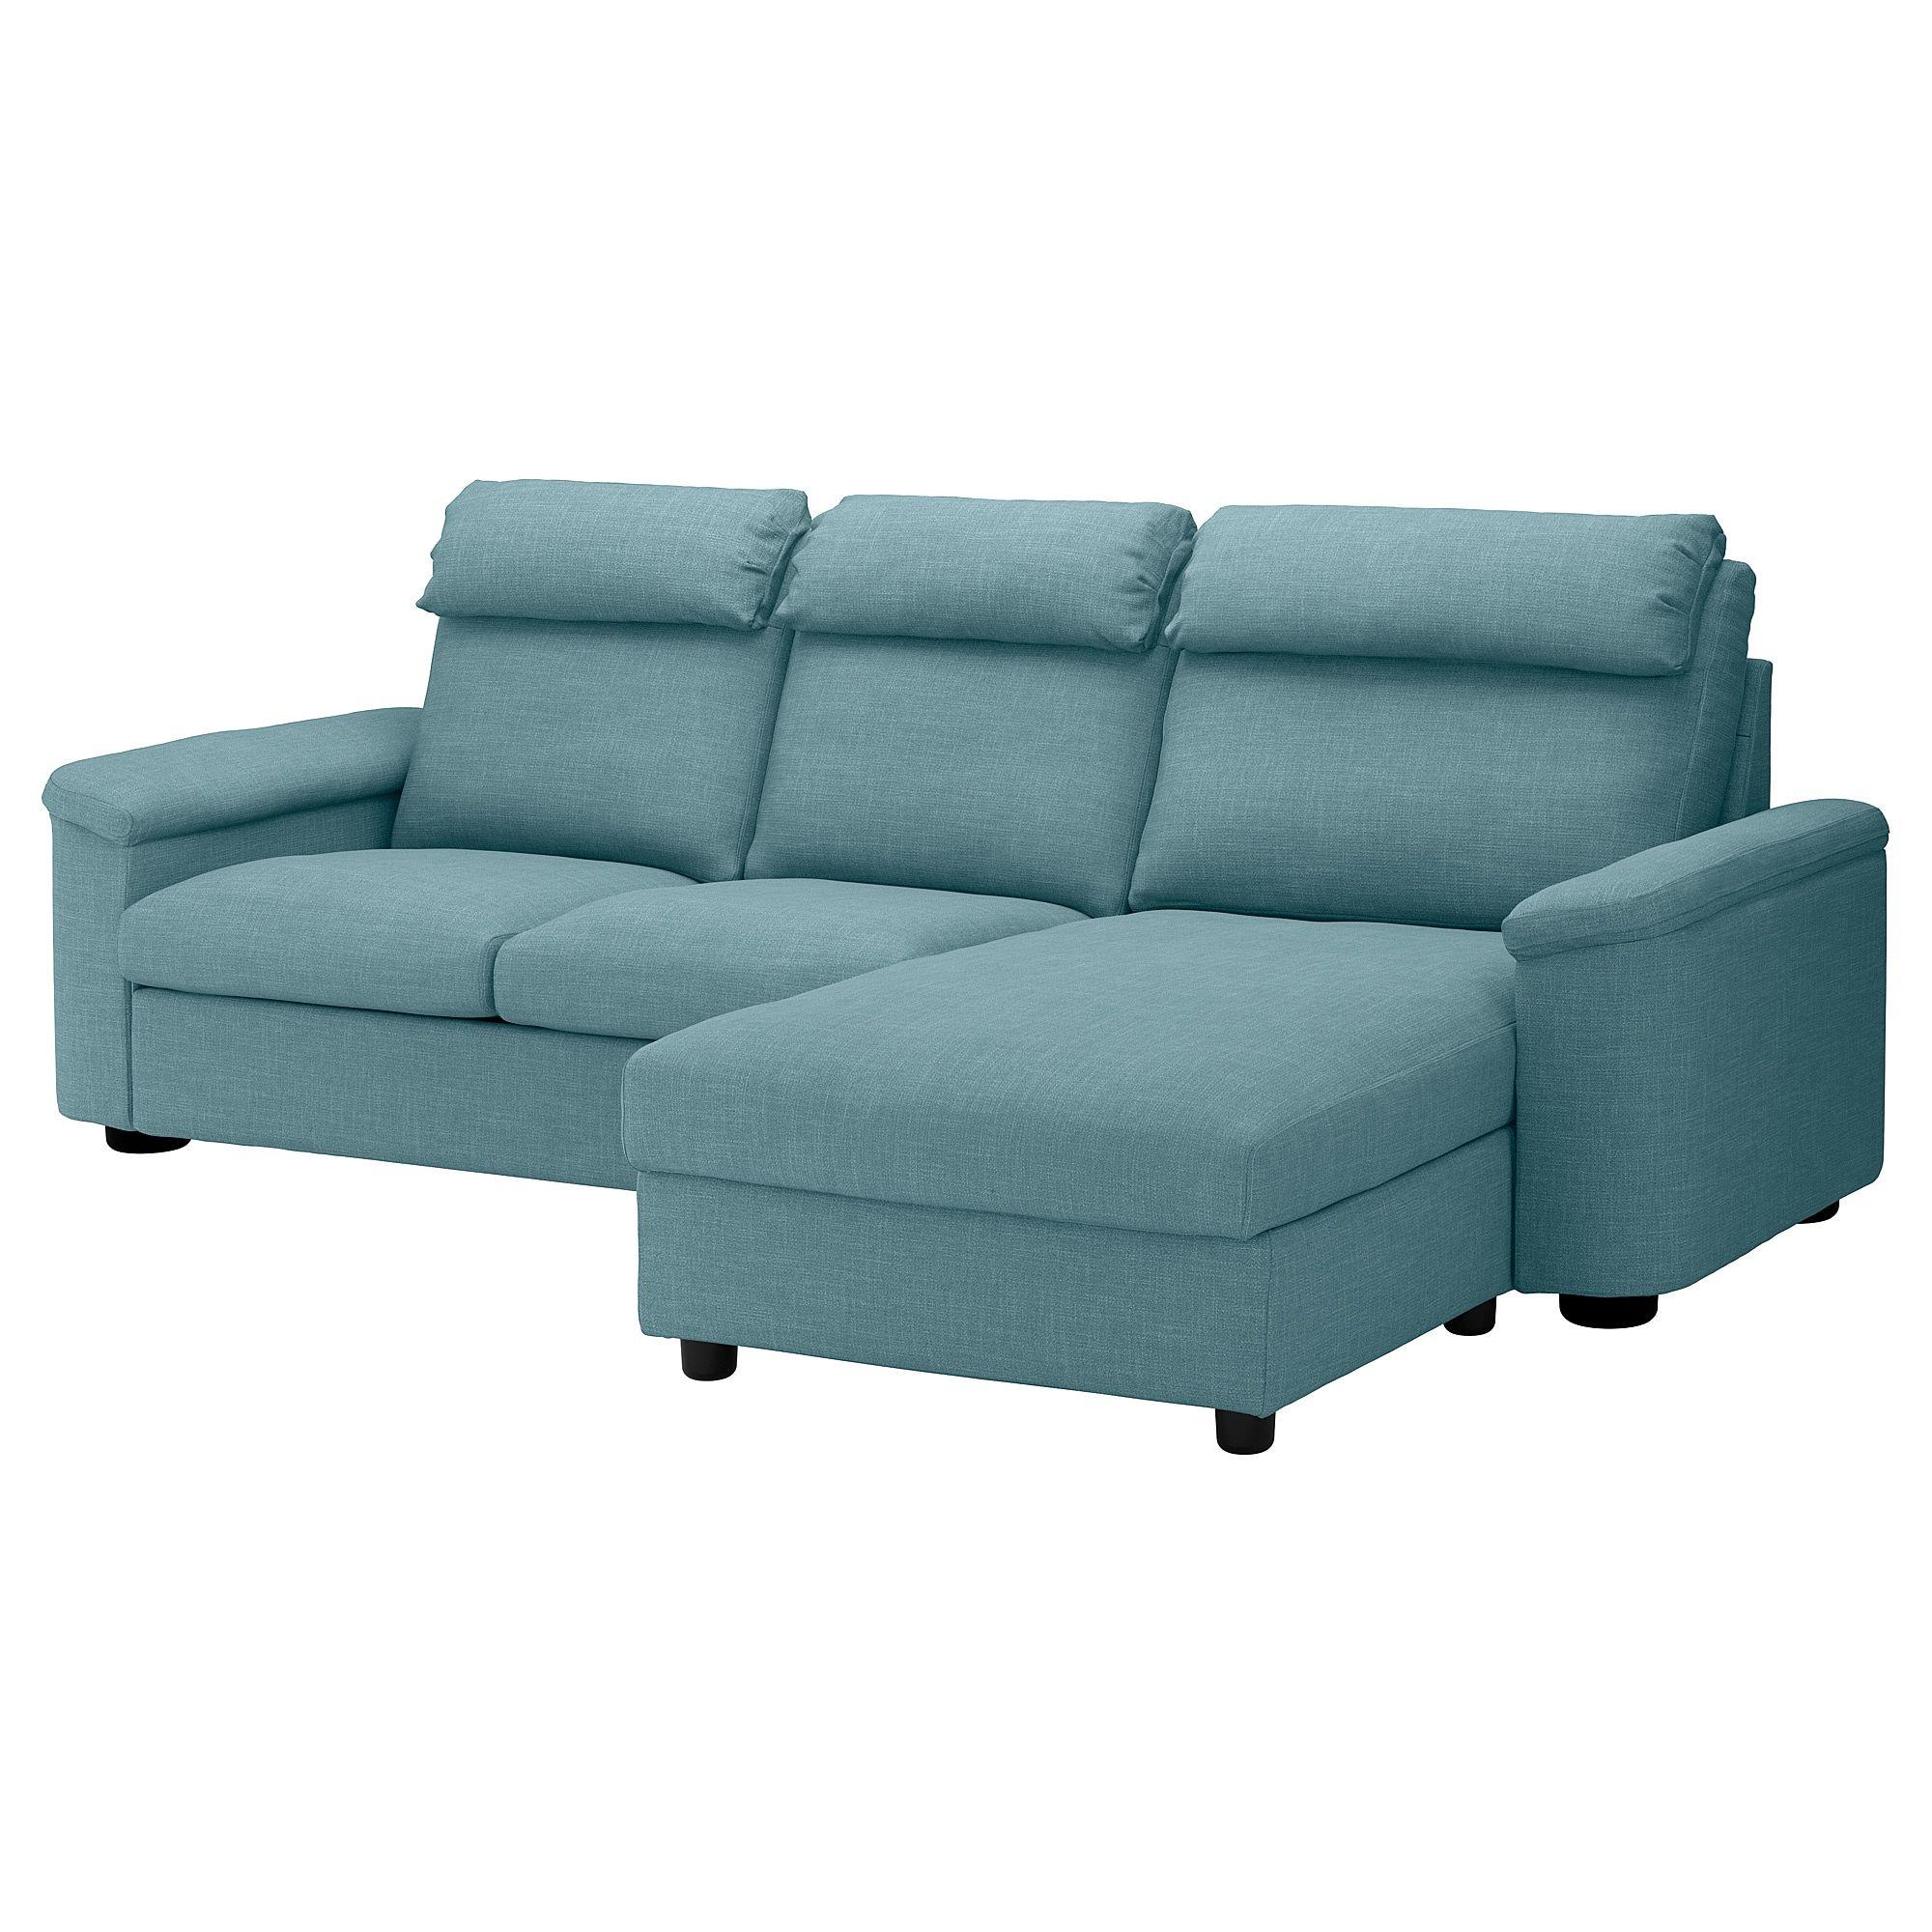 Lidhult 3er Sofa Mit Recamiere Gassebol Blau Grau Ikea Deutschland Sofa Back Cushions Sleeper Sofa Chaise